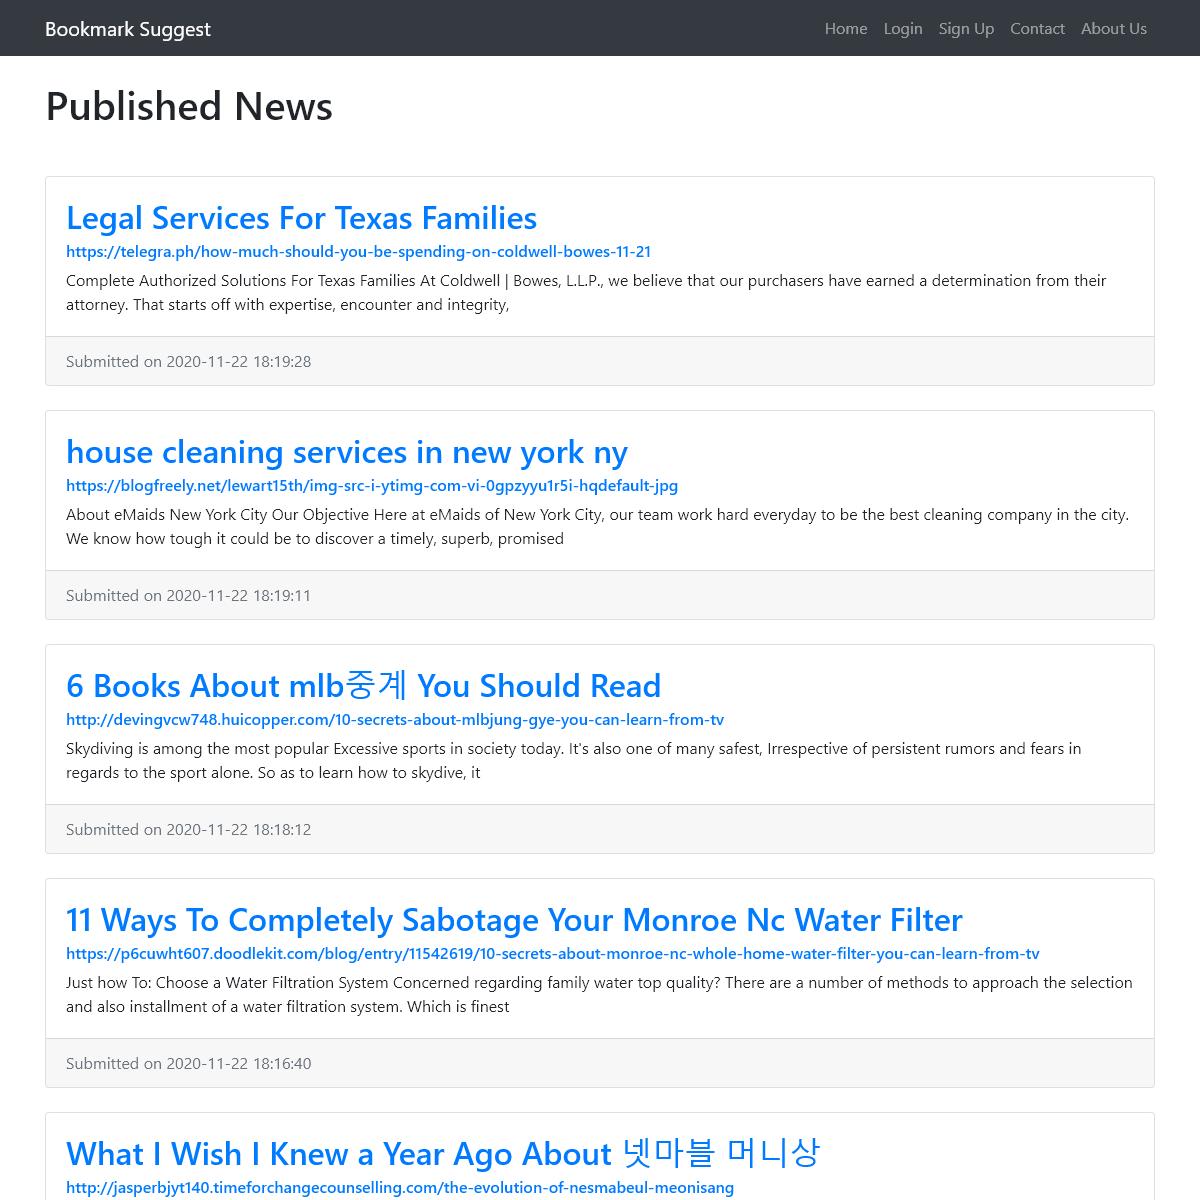 Published News - Bookmark Suggest